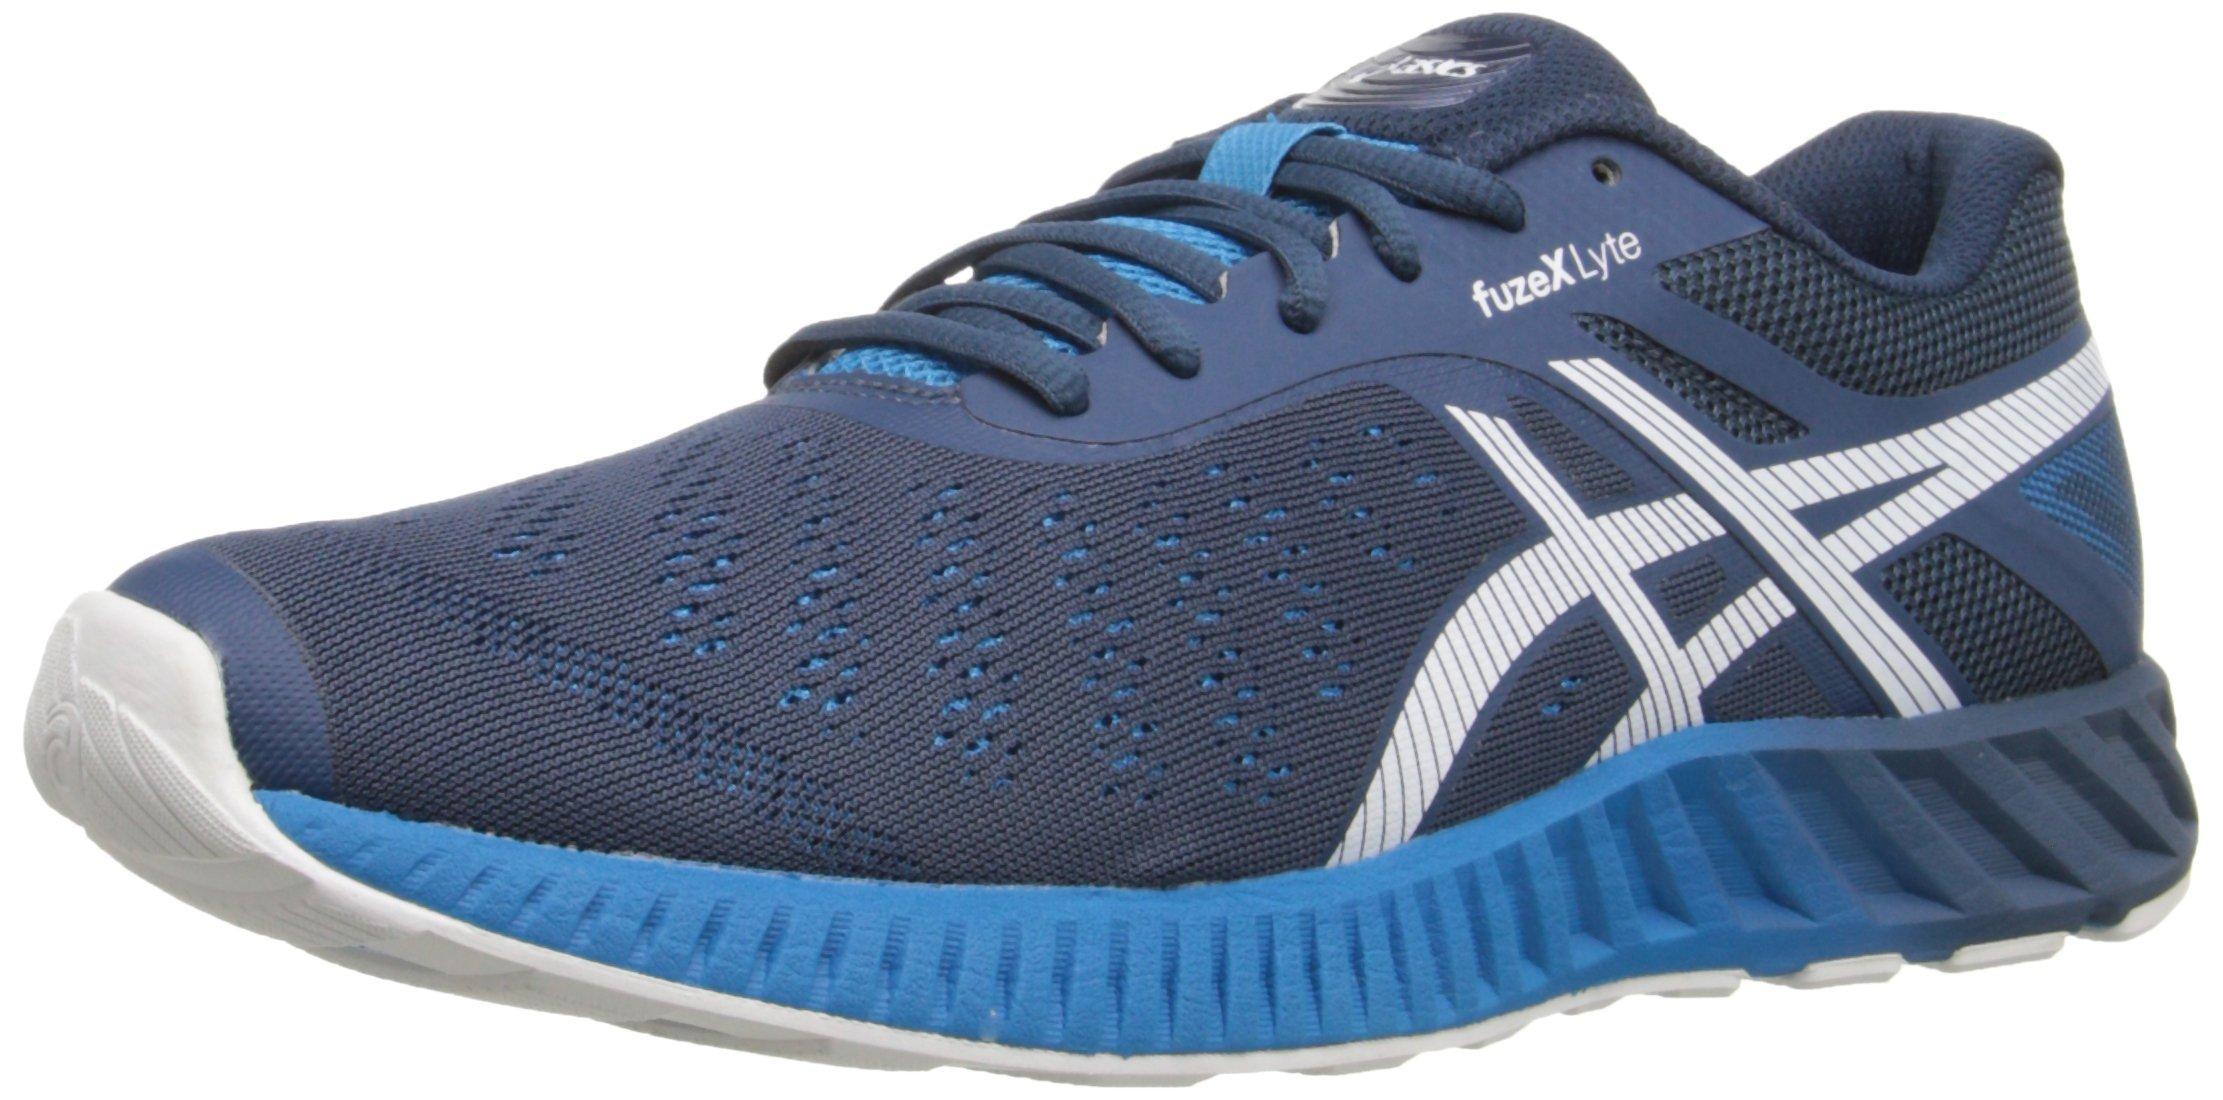 ASICS Men's Fuzex Lyte Running Shoe, Ink/White/Methyl Blue, 10 M US